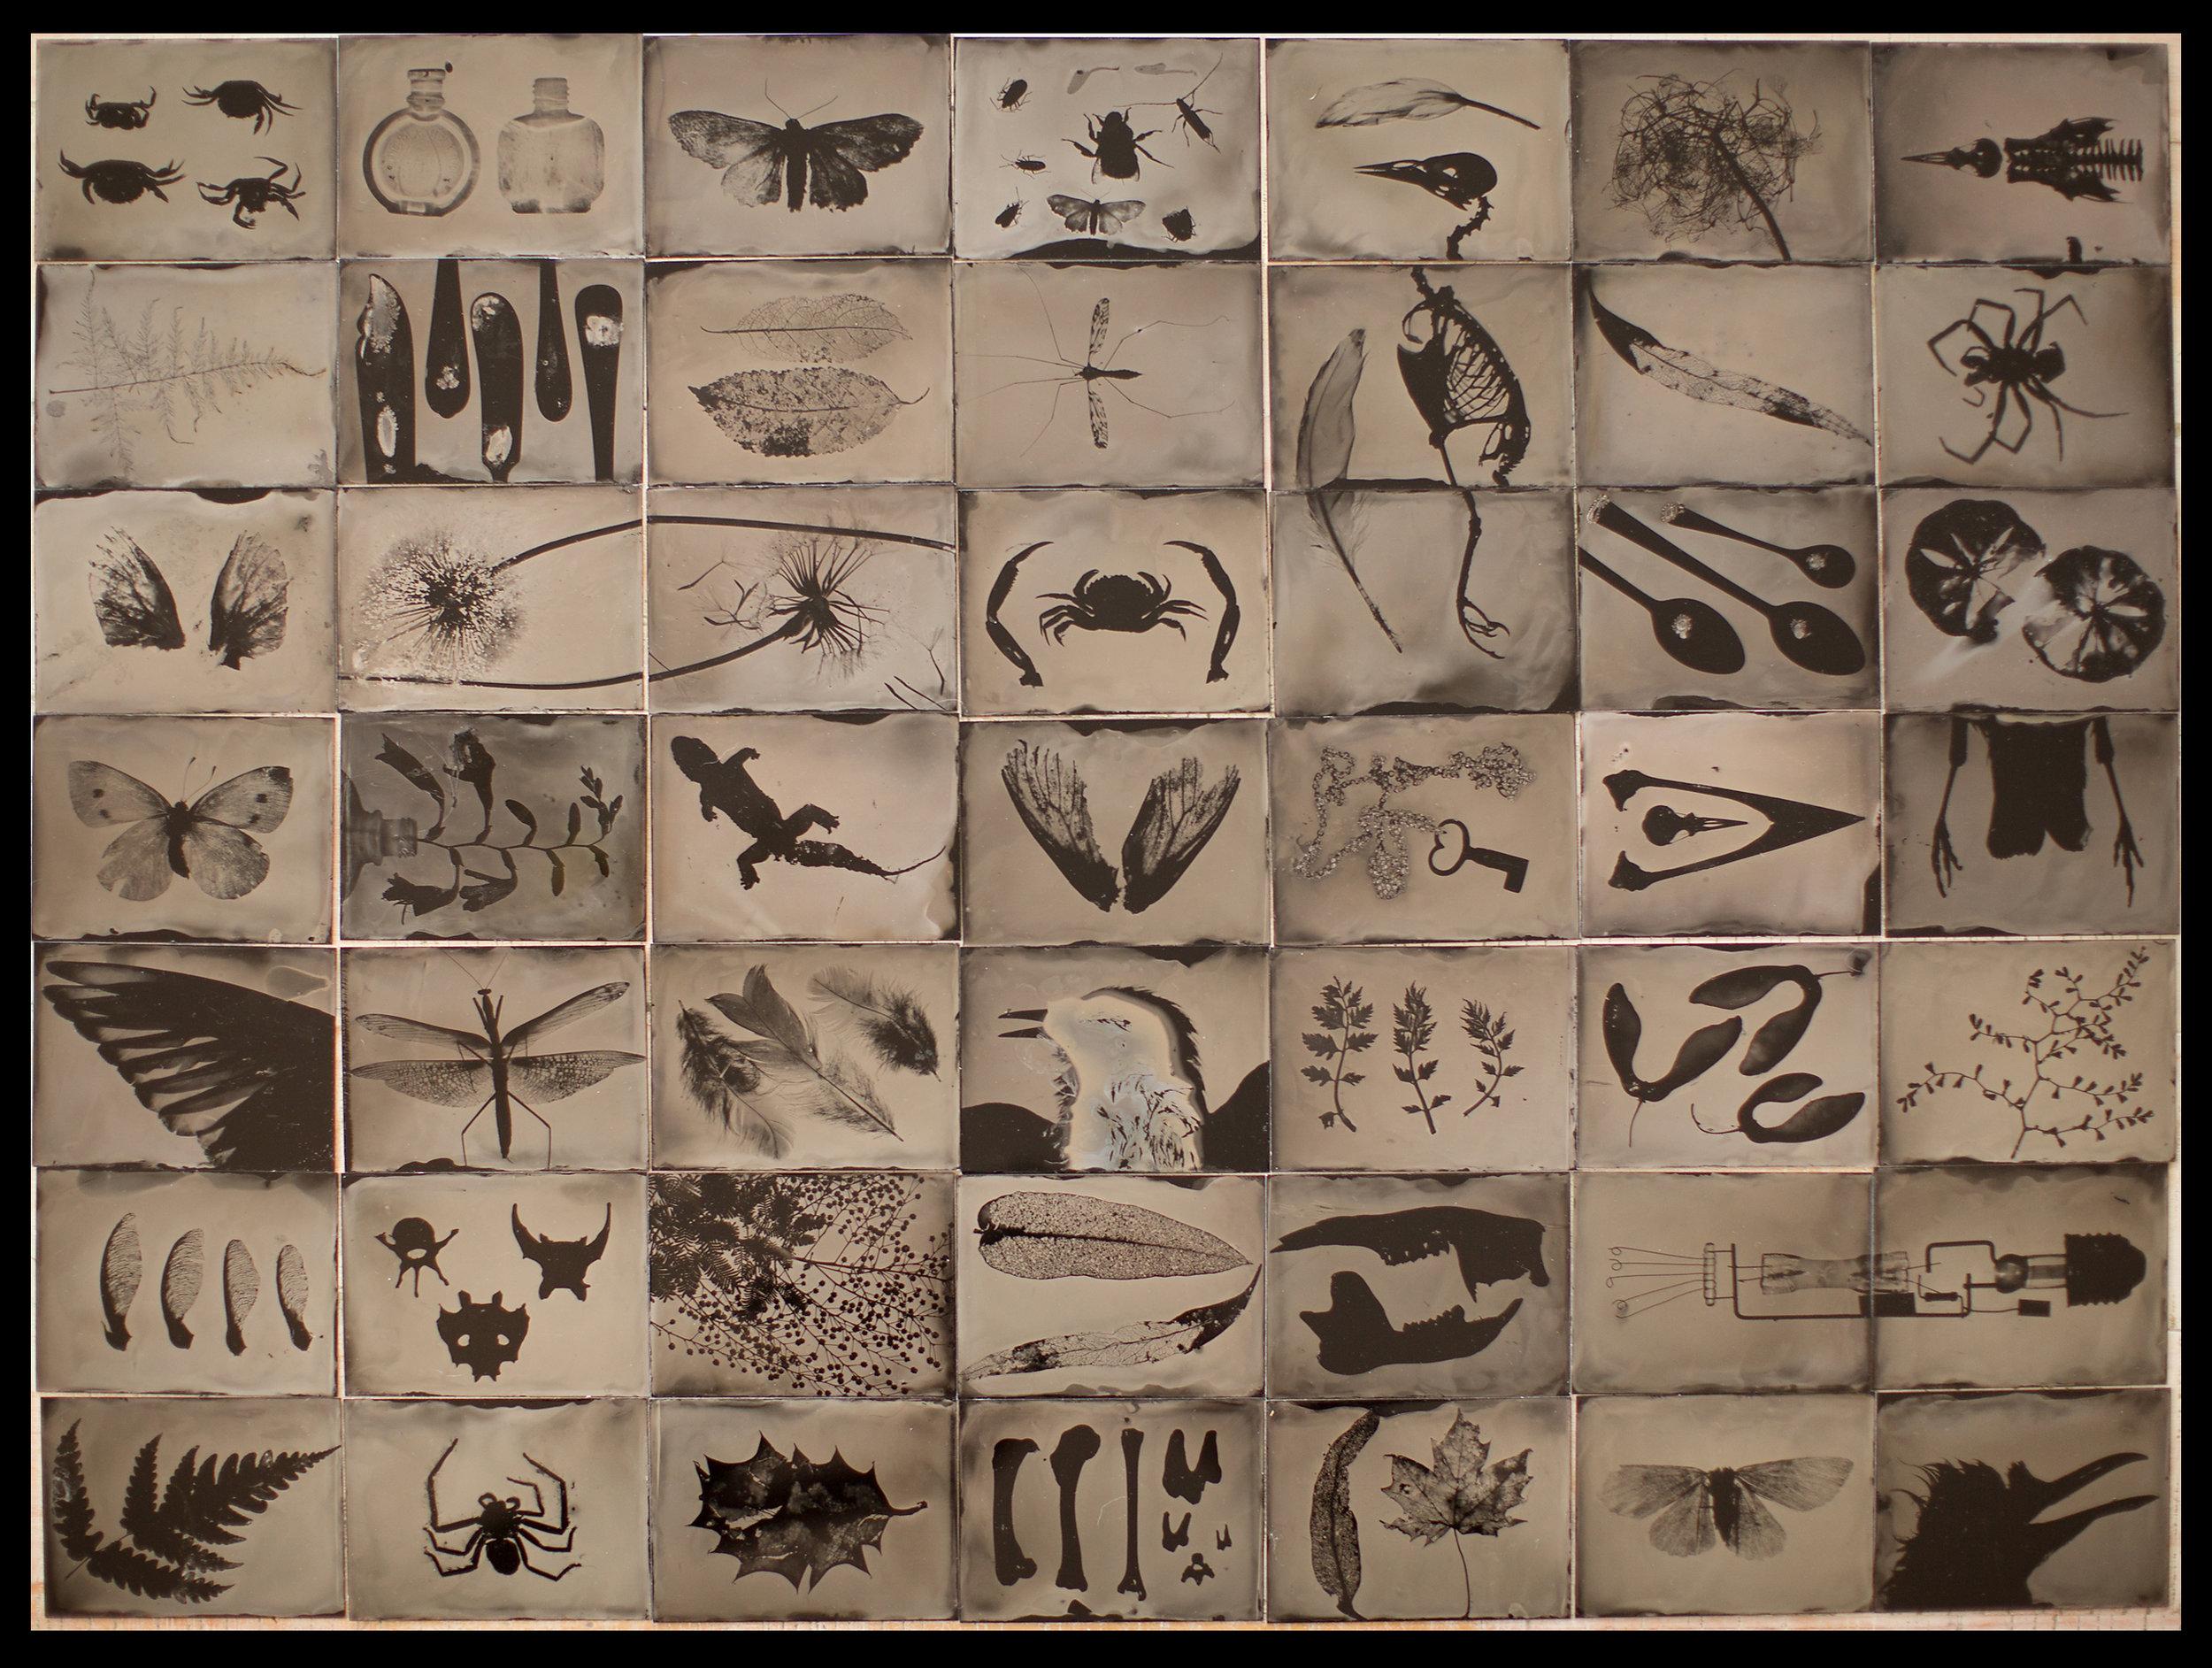 Odyssey | photograms | wet plate collodion | Steve Lovegrove